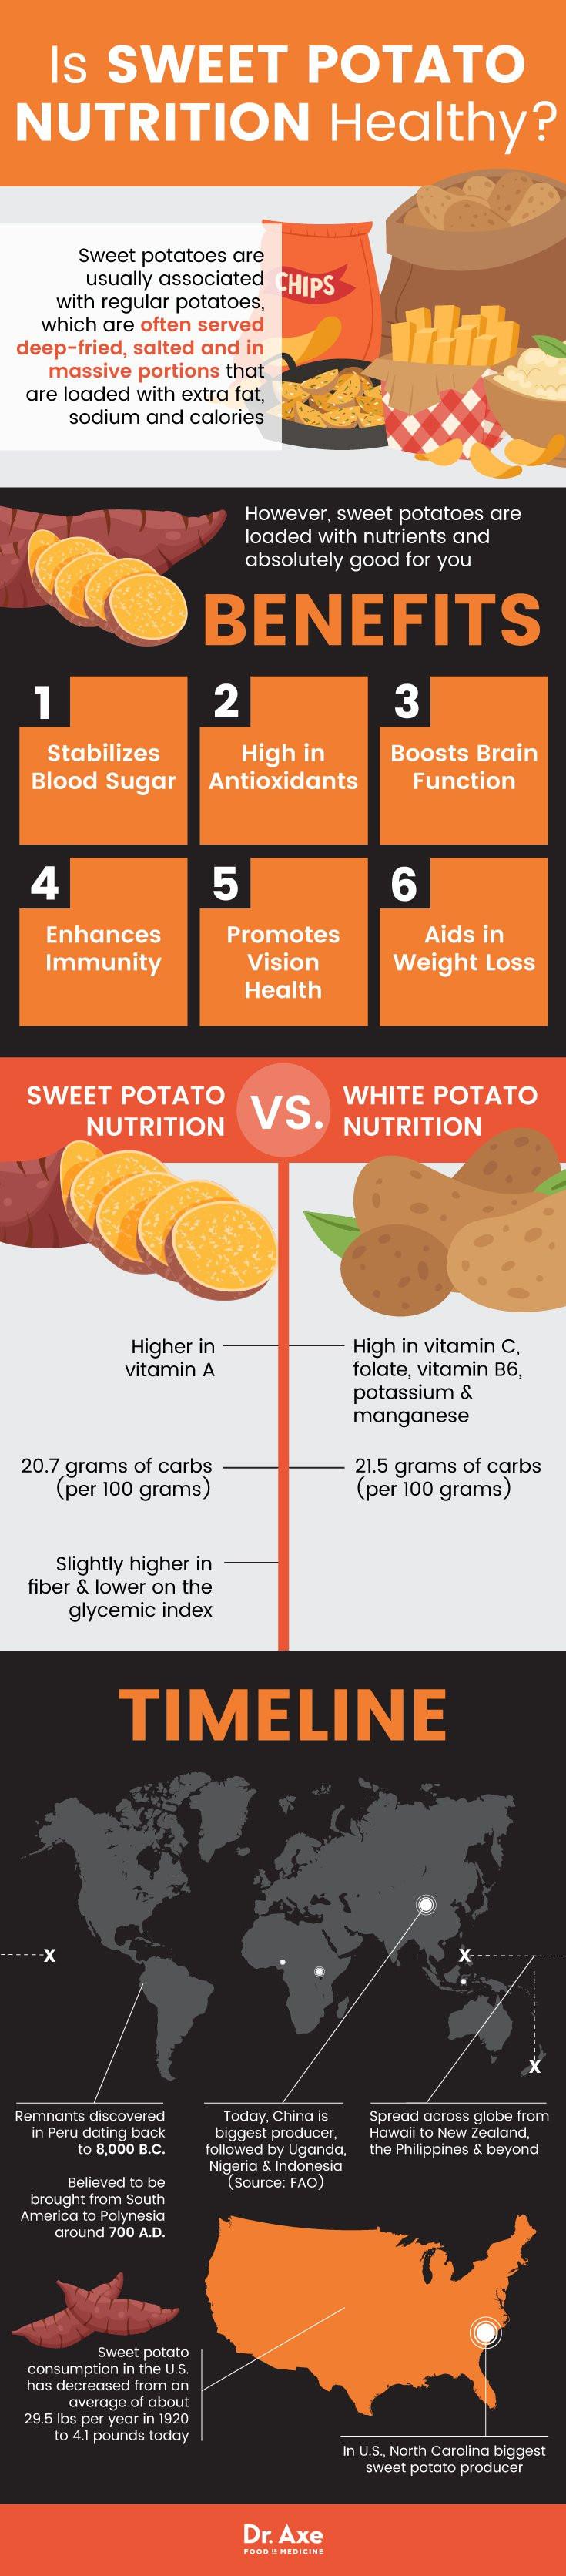 Sweet Potato Nutritional Value  Sweet Potato Nutrition Facts PLUS Benefits DrAxe